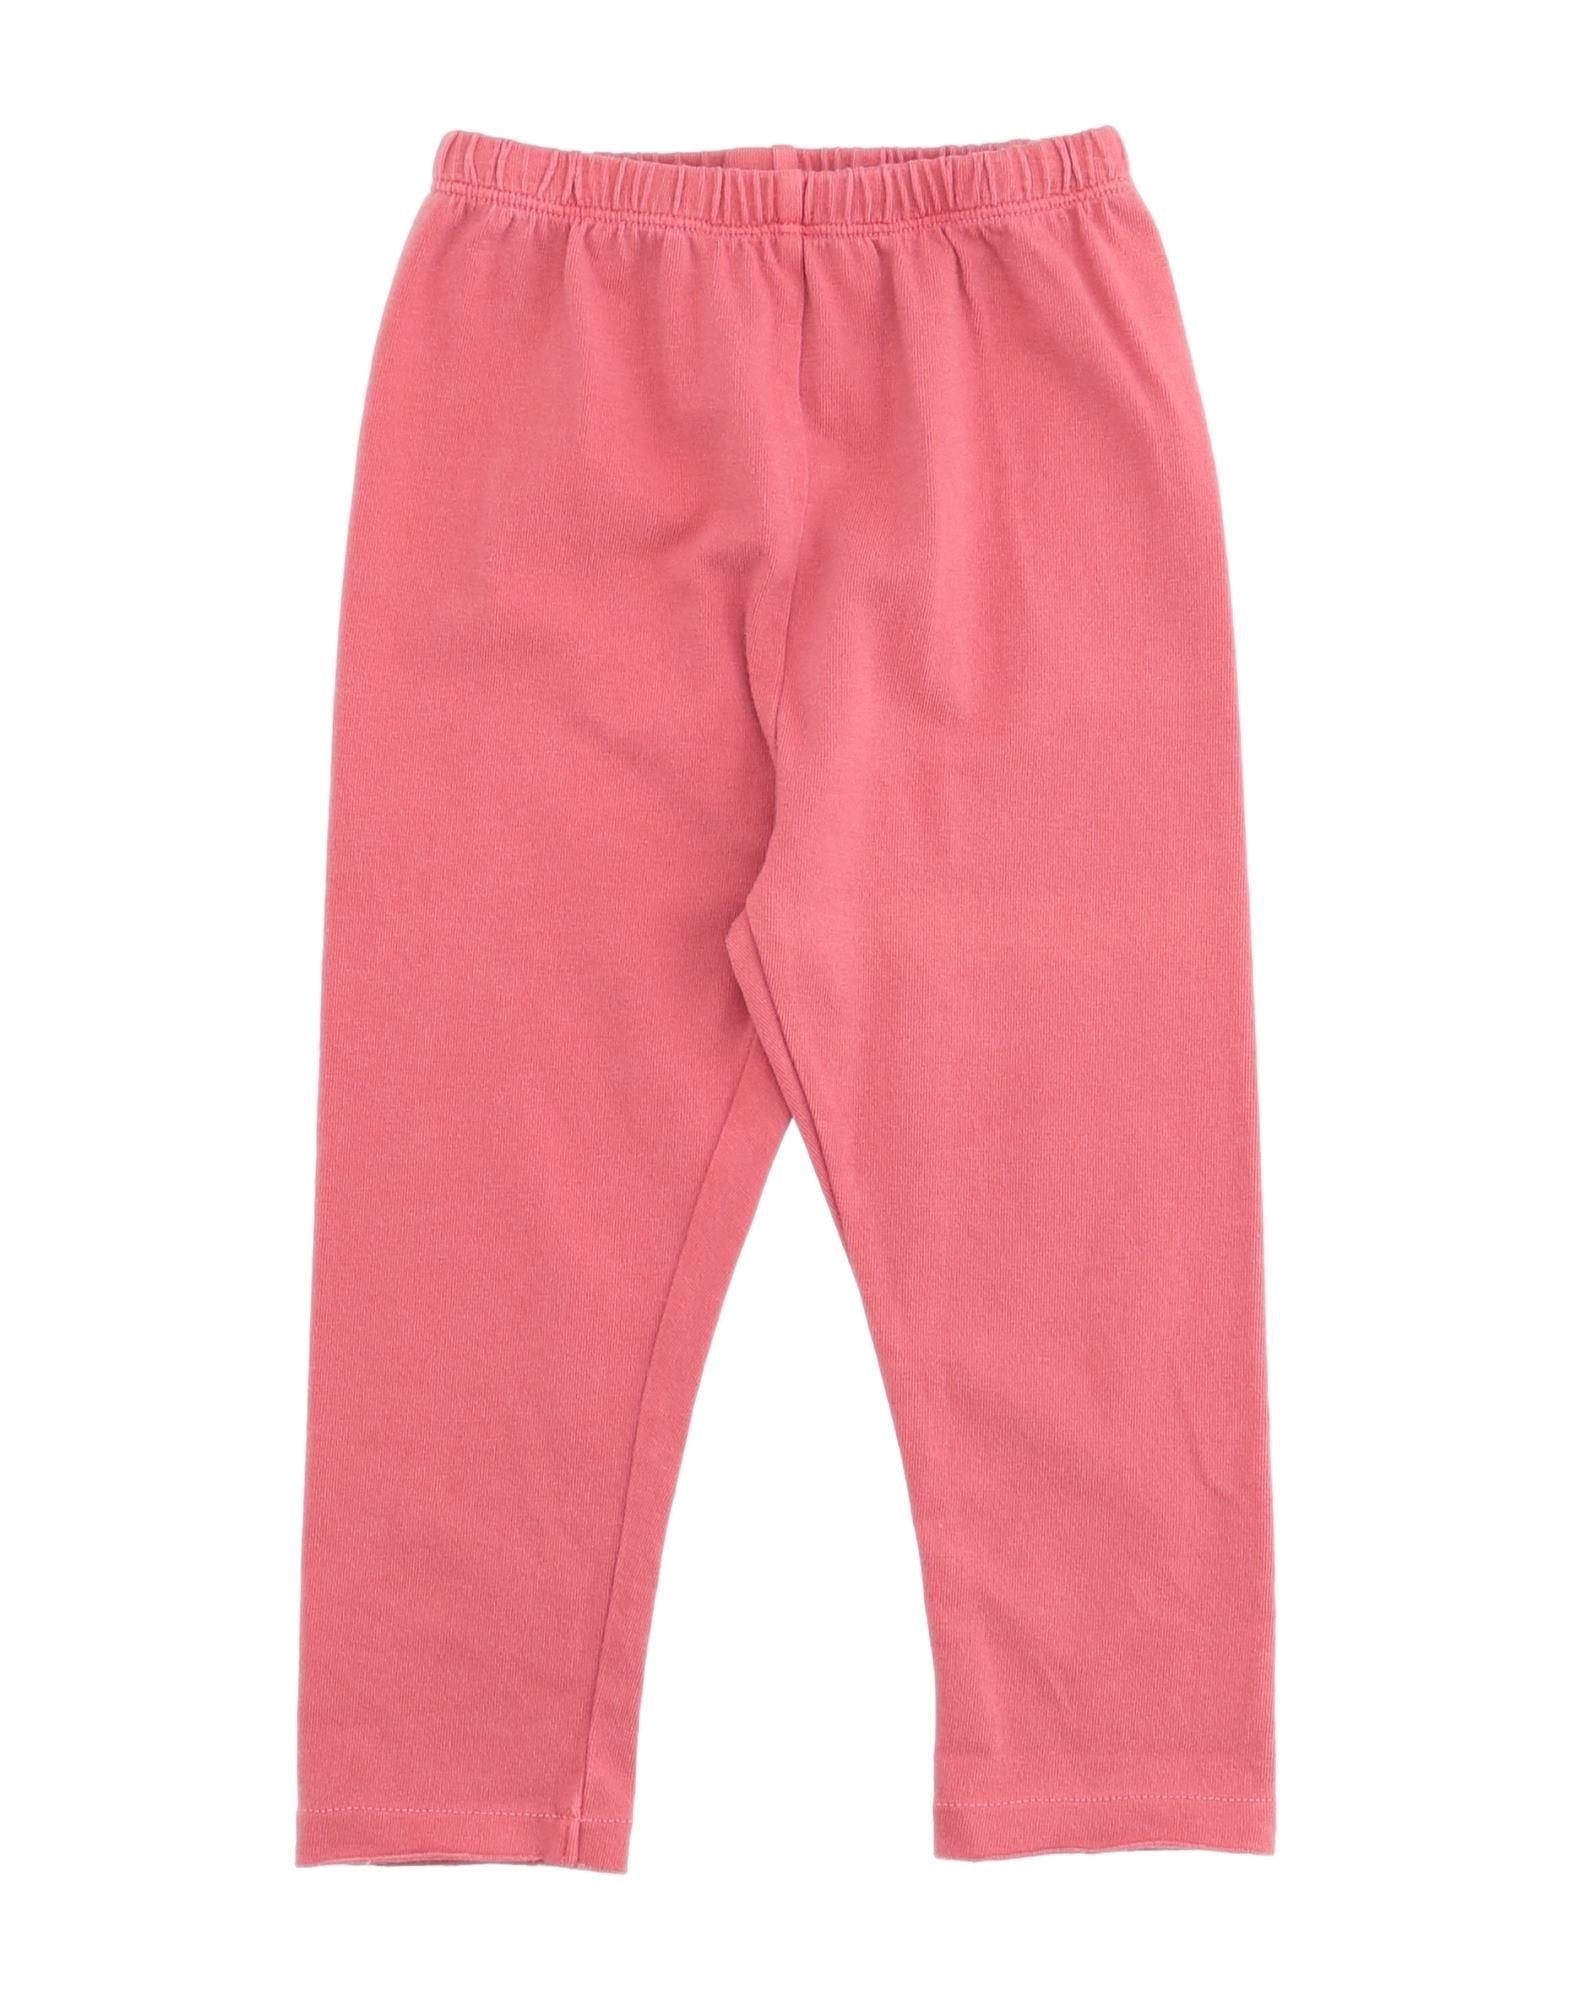 Mapero Kids' Leggings In Pink